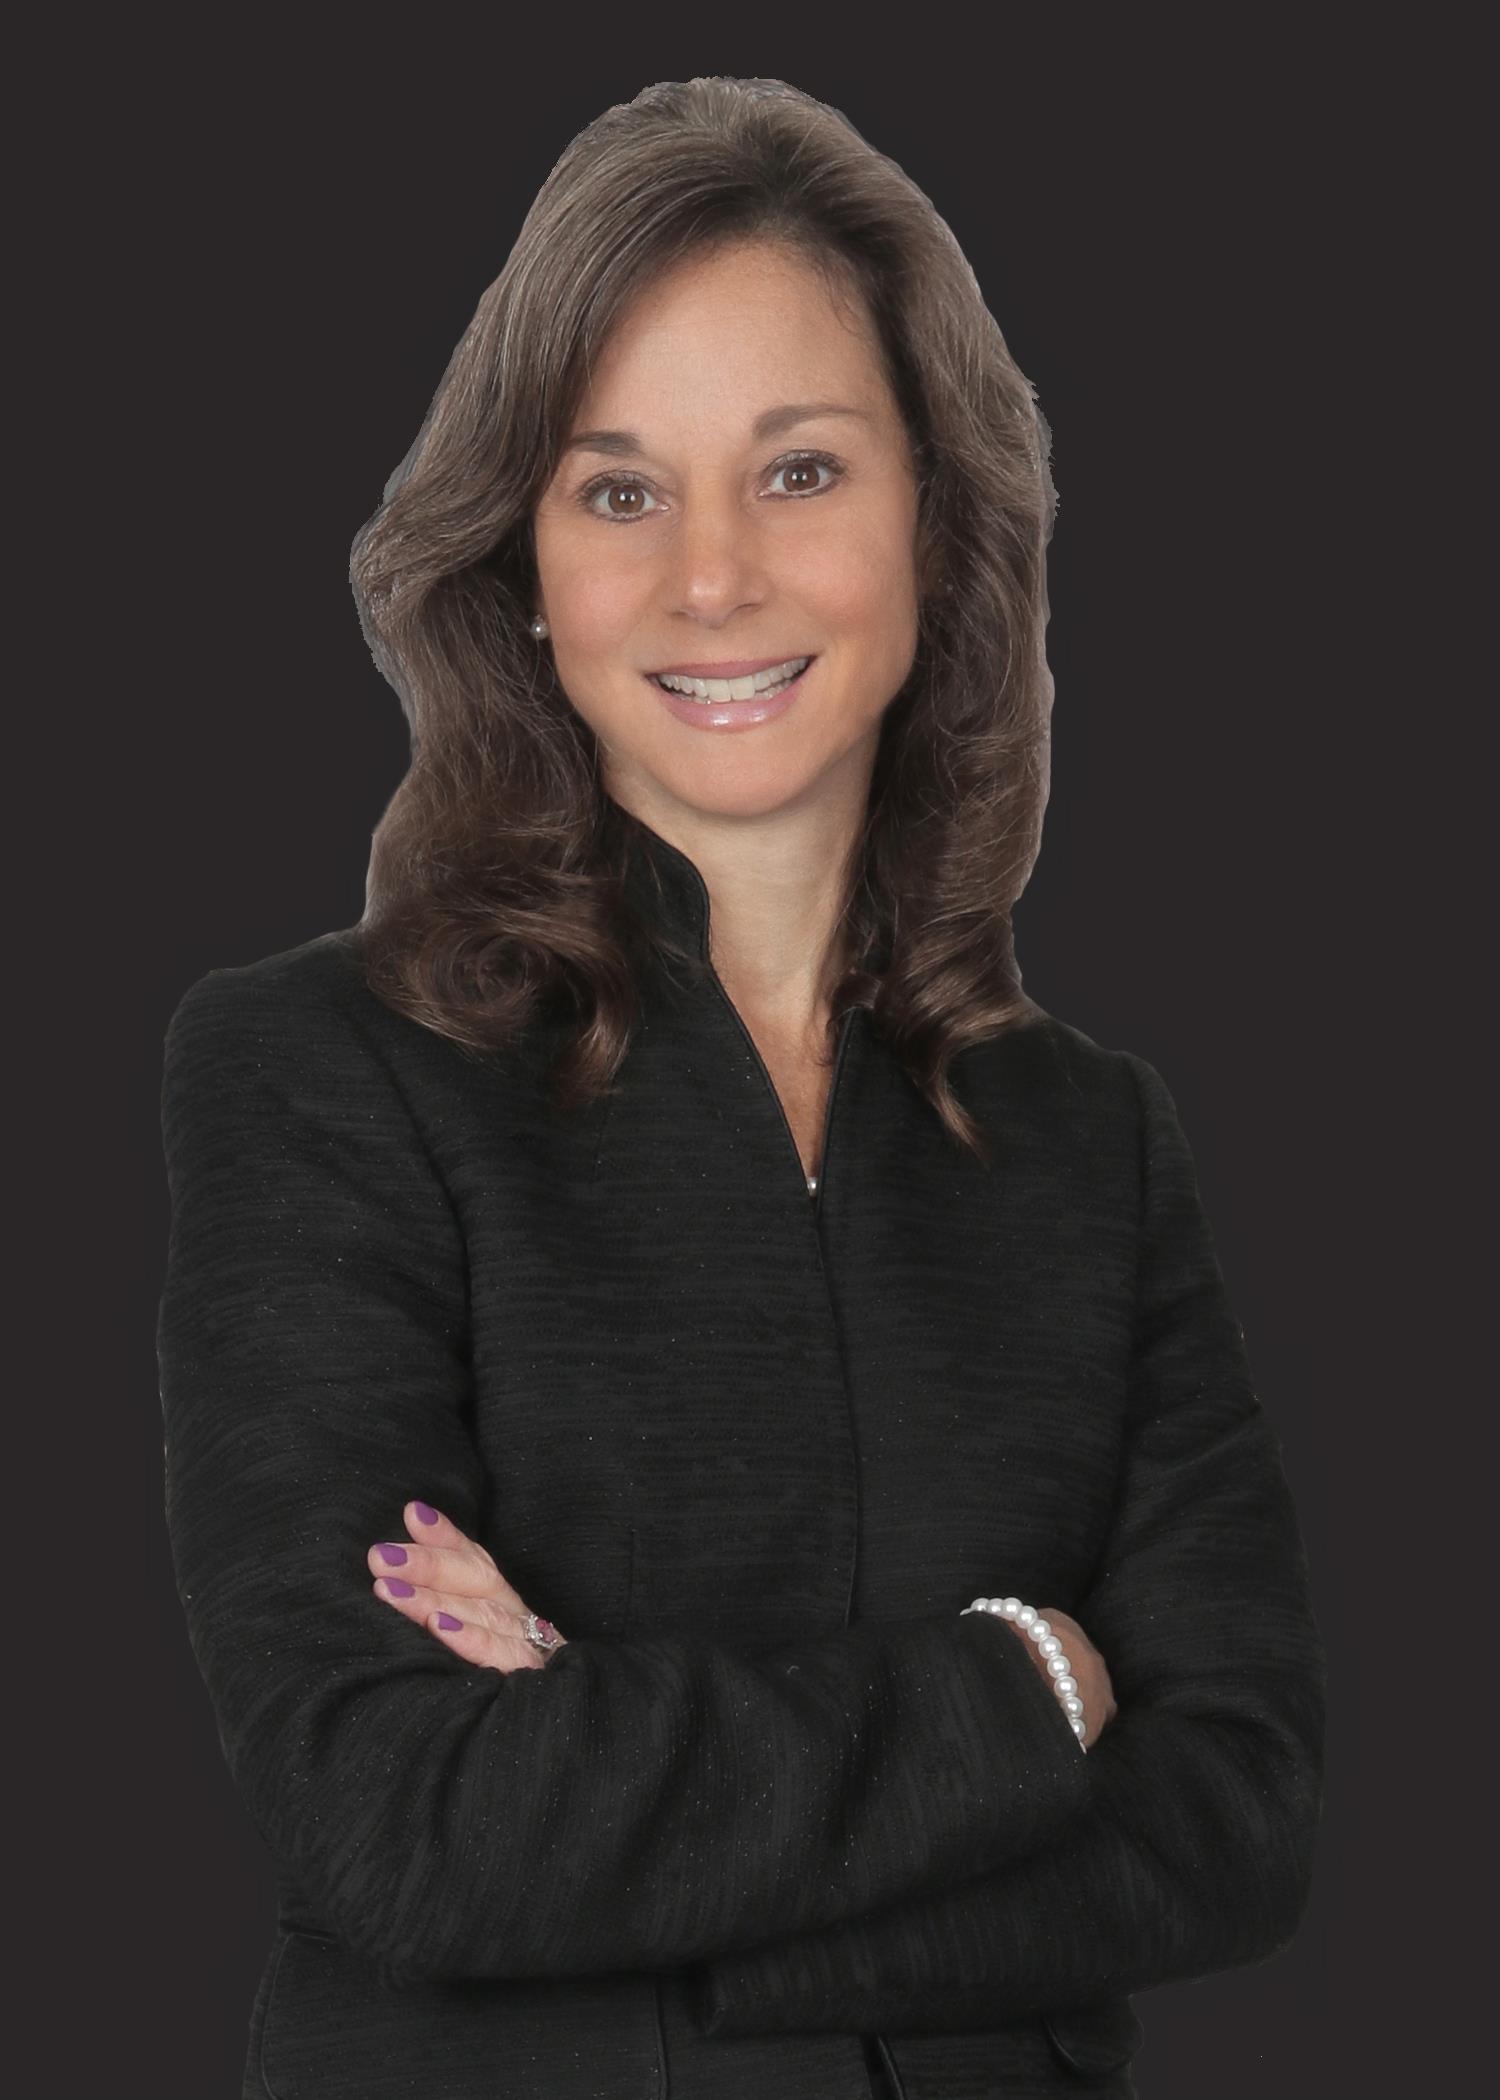 Deborah Silberstein